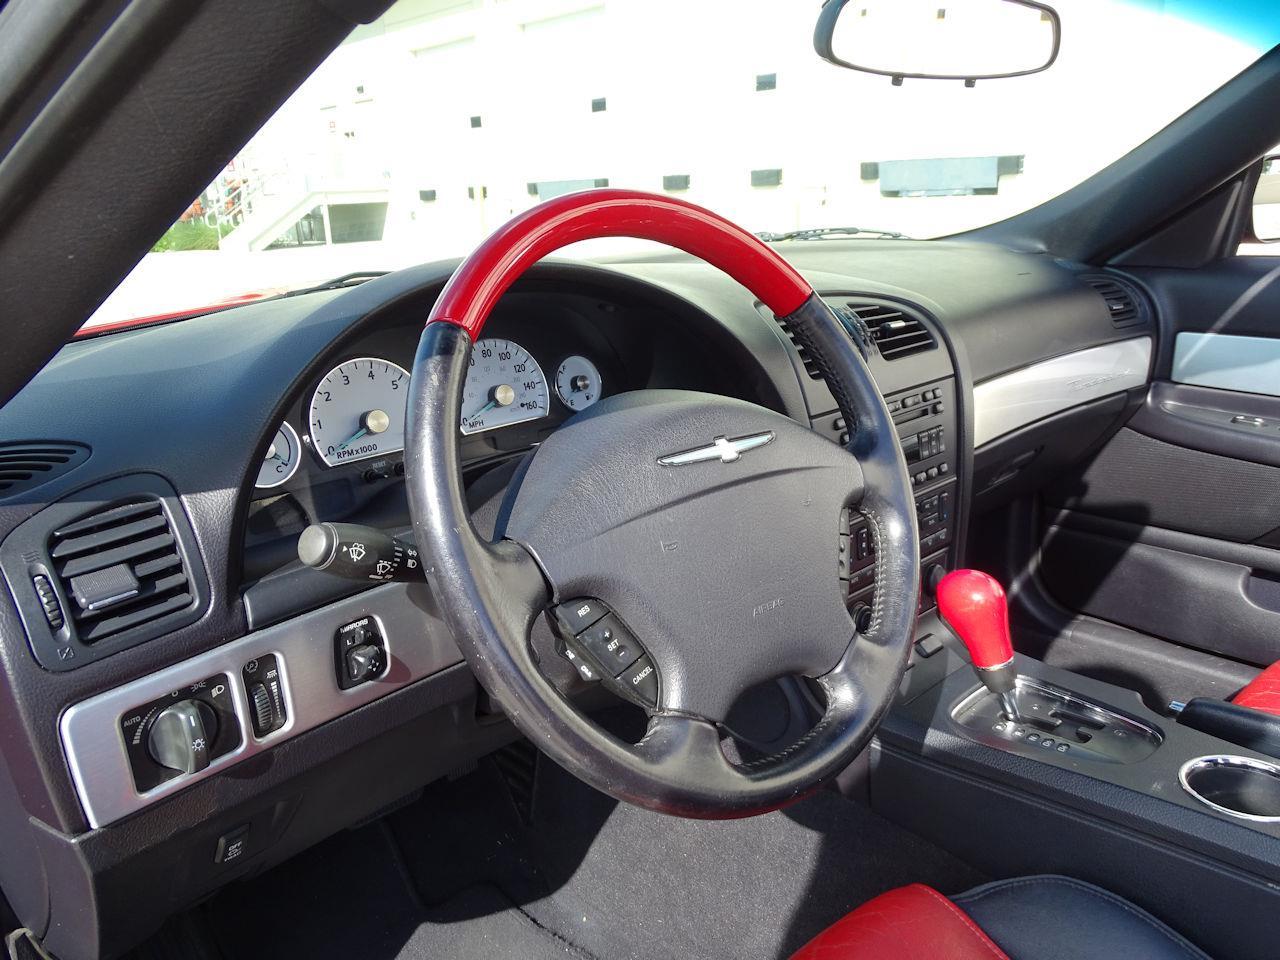 2003 Ford Thunderbird (CC-1341396) for sale in O'Fallon, Illinois